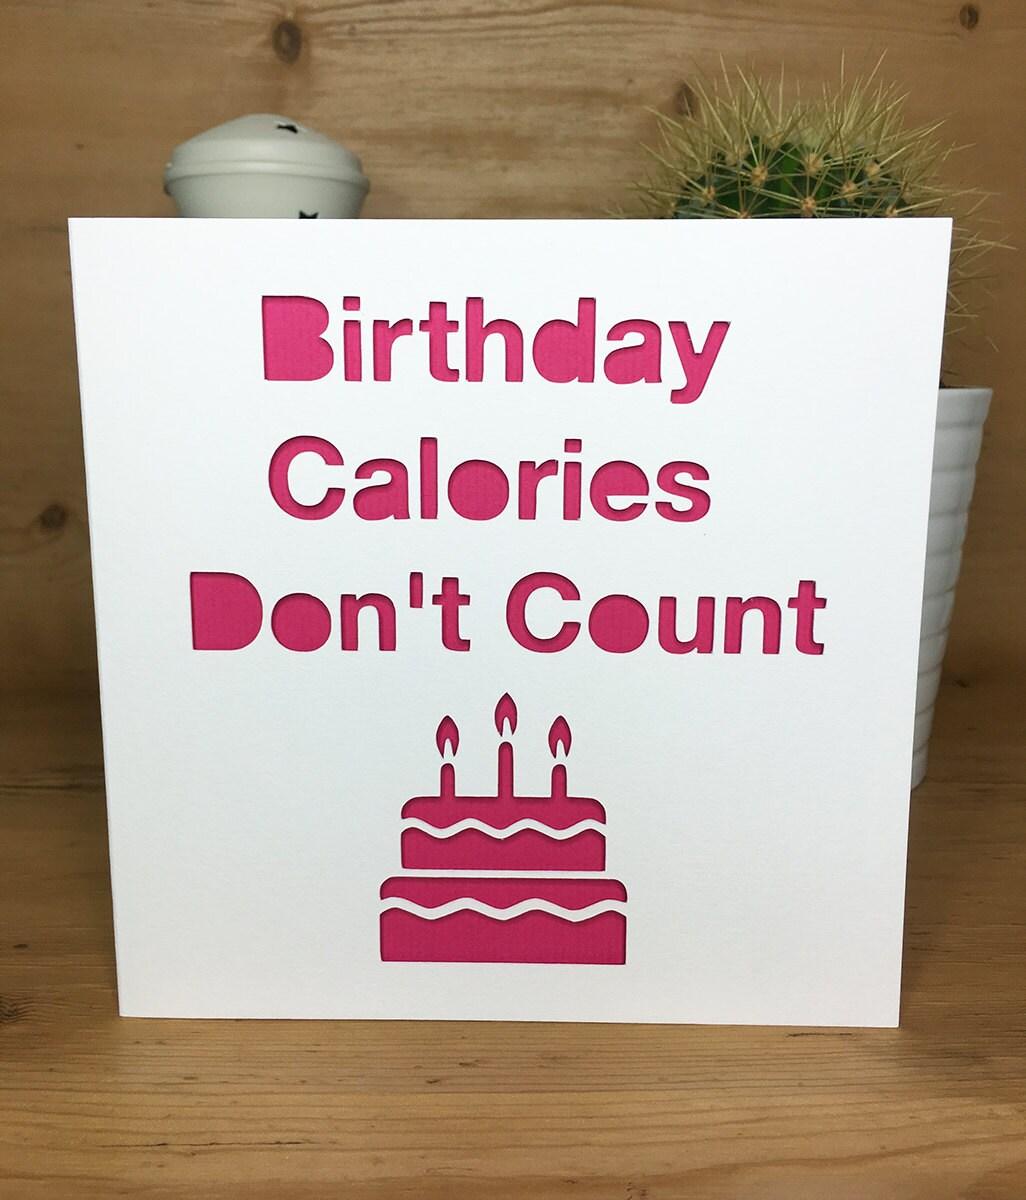 Funny Birthday Card Cake Calories Diet Happy Birthday Card